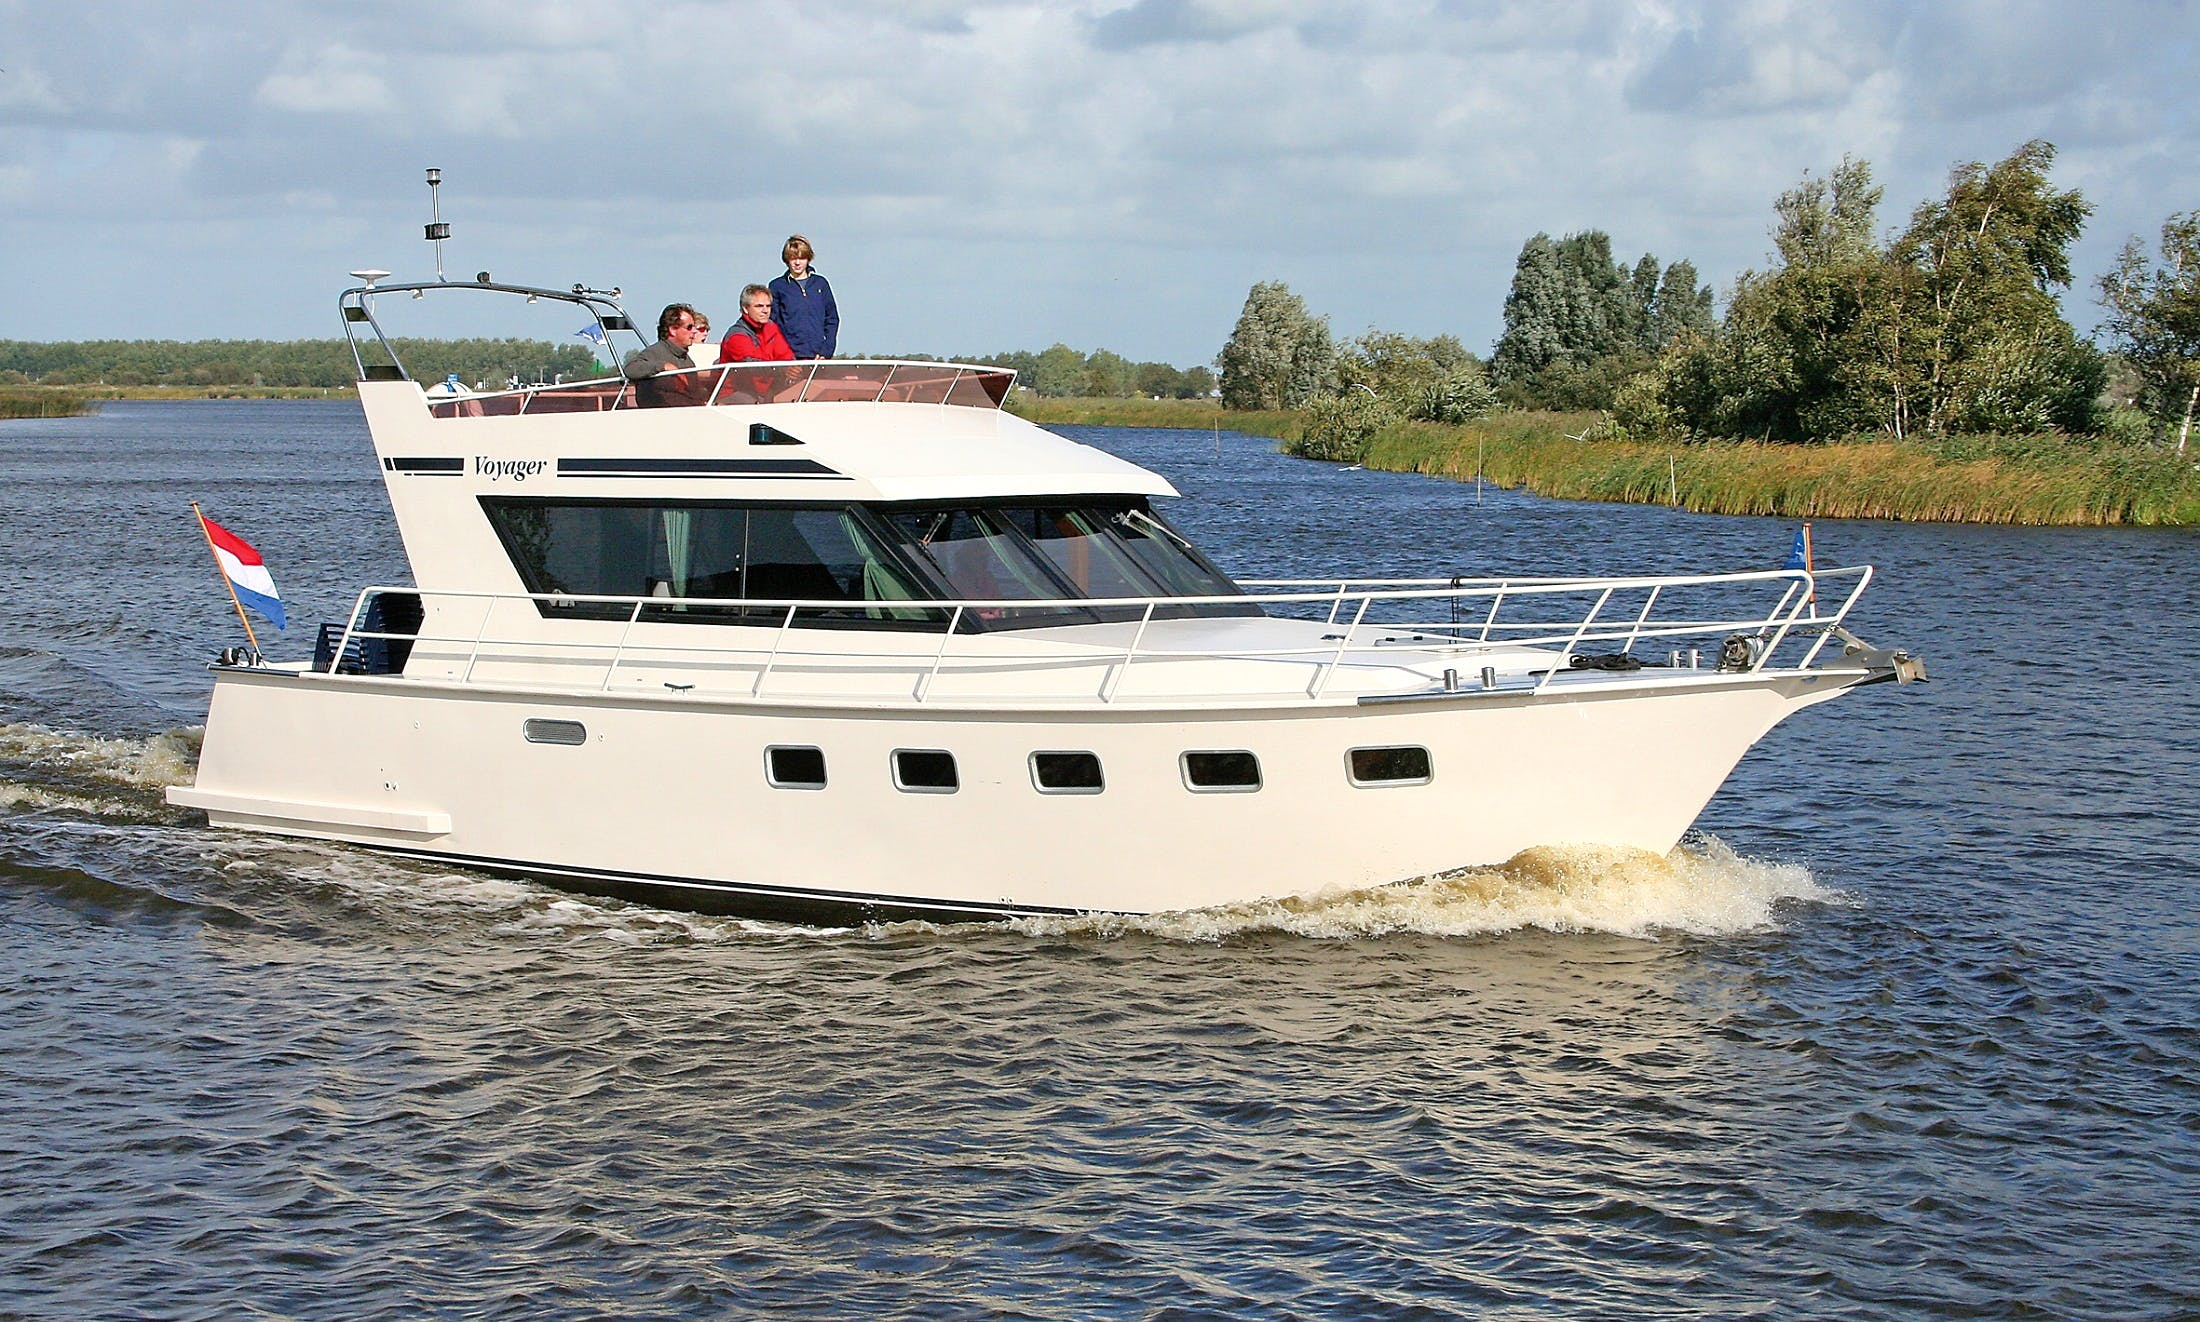 39' Vacance 1200 Motor Yacht Charter in Drachten, Netherlands